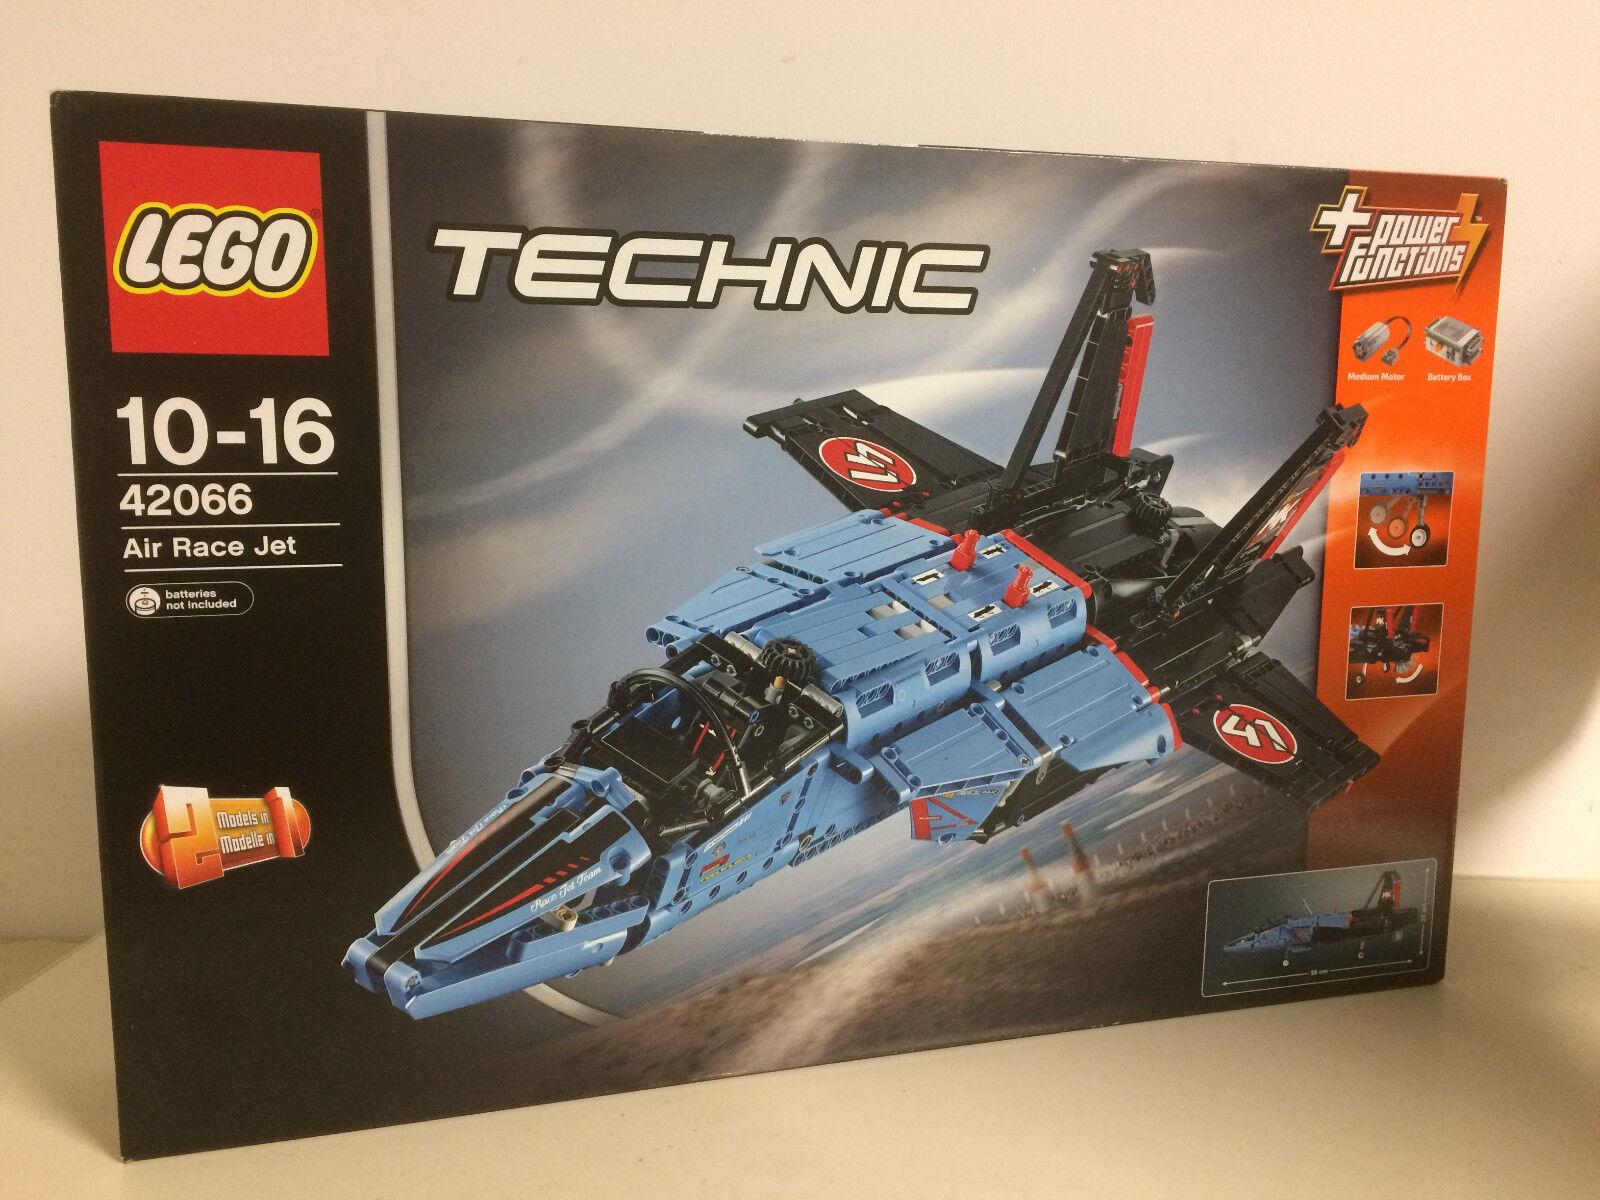 LEGO  TECHNIC 42066 AIR RACE JET JET DA GARA 2 in 1 + POWER FUNCTIONS new nuovo